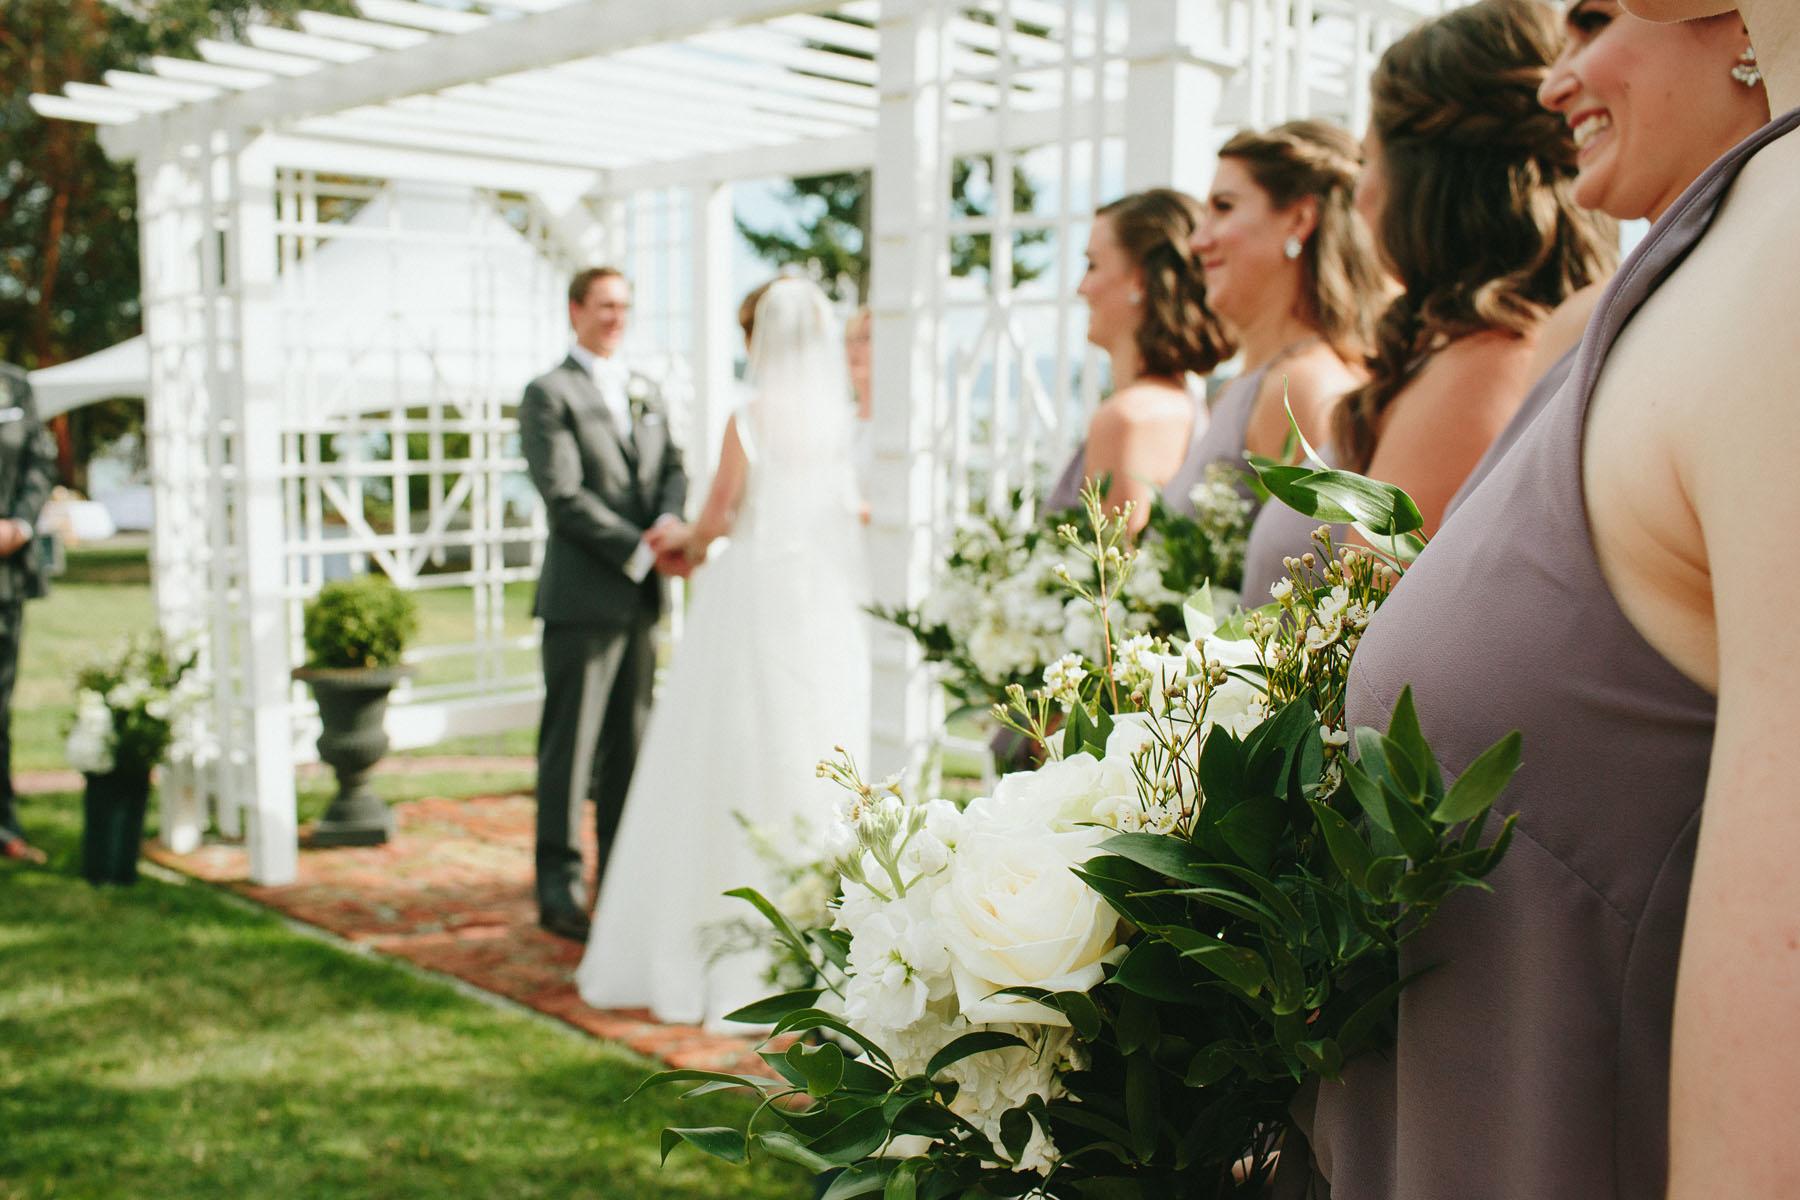 thetis-island-wedding-photographer-rp-rn-083.jpg